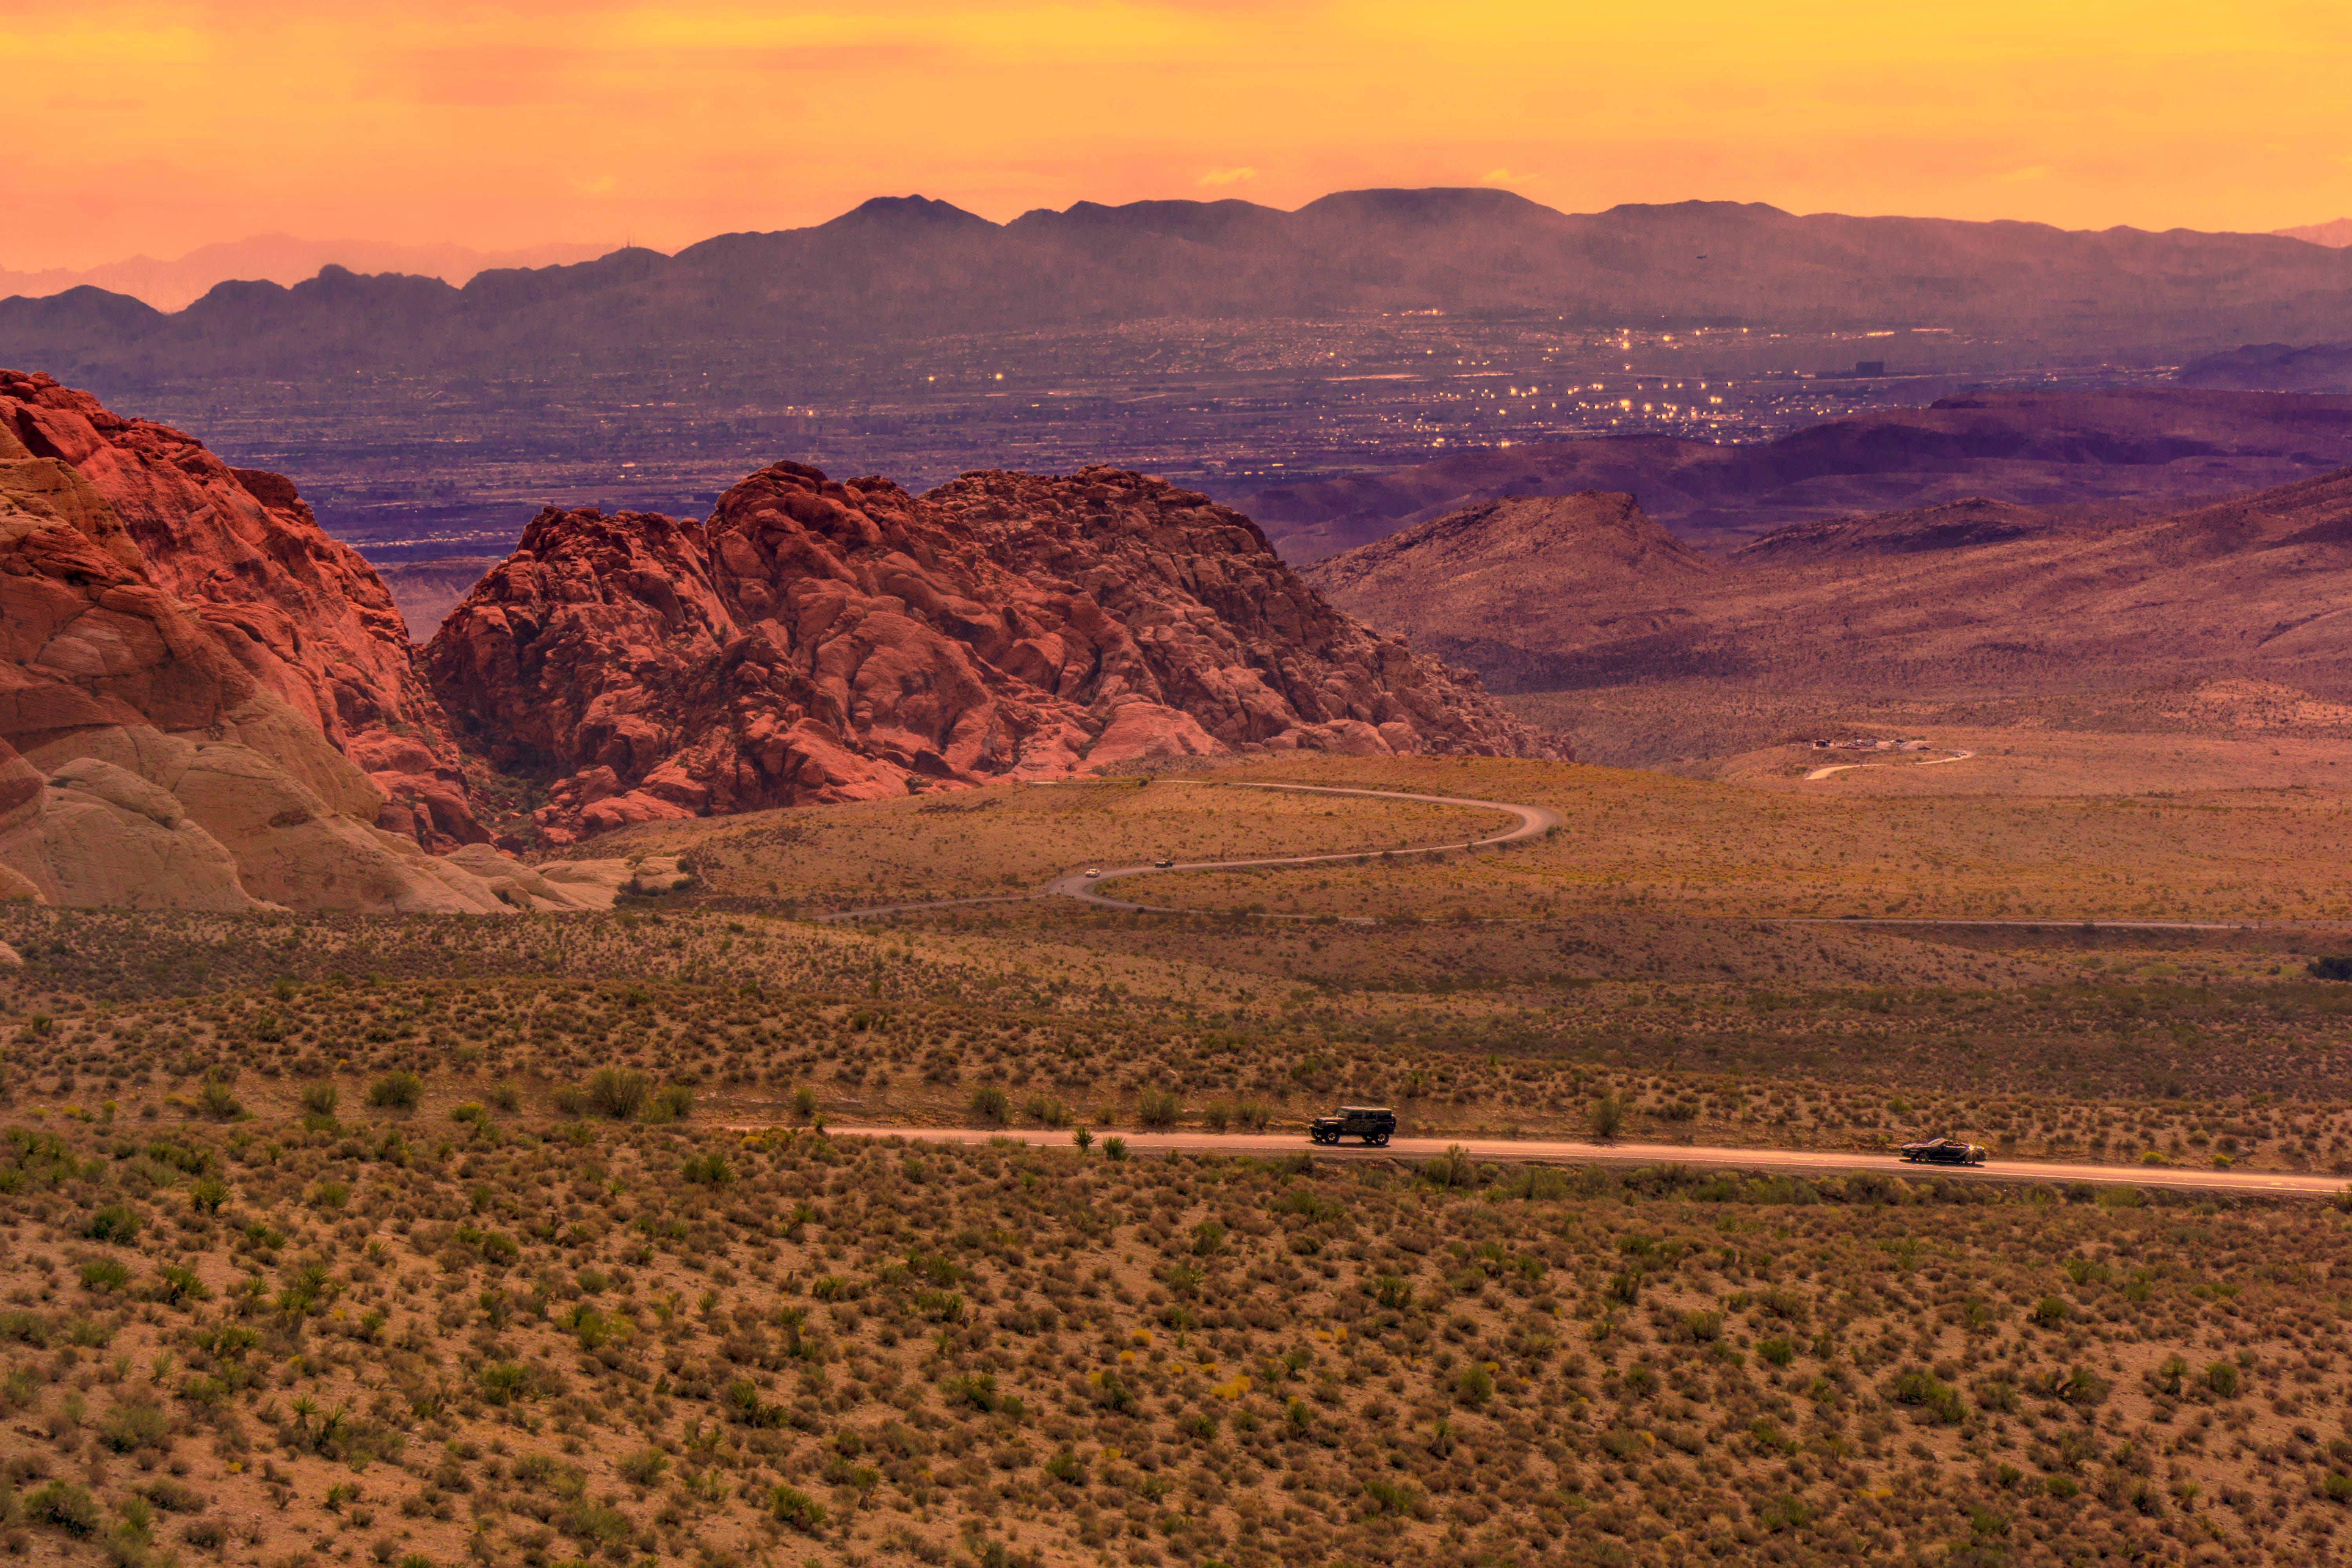 Kostenloses Stock Foto zu arizona, berge, blick auf die berge, canyon